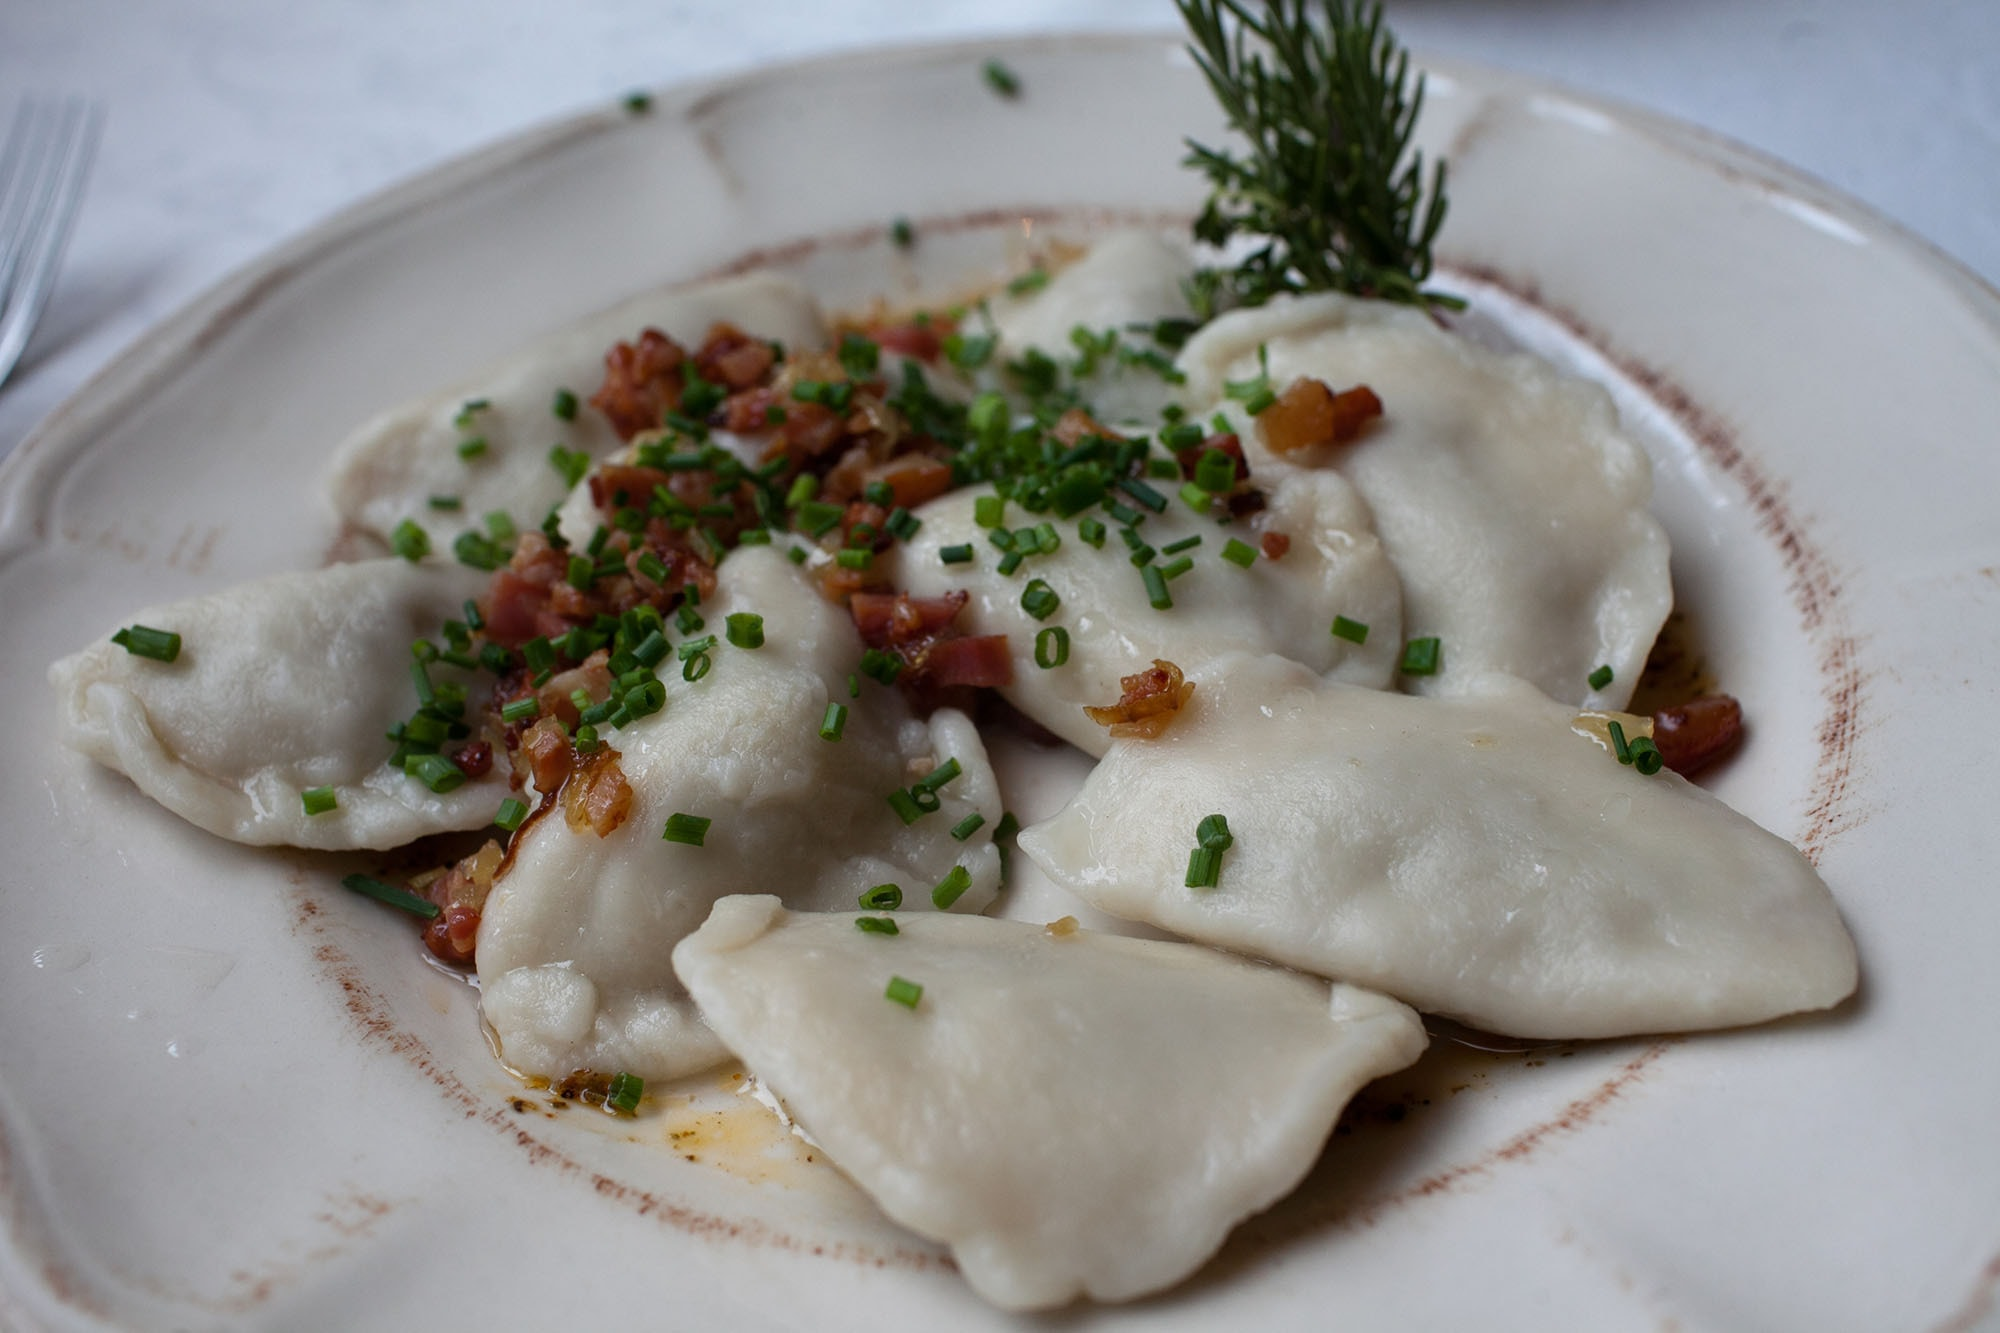 Meat pierogi in Krakow, Poland.